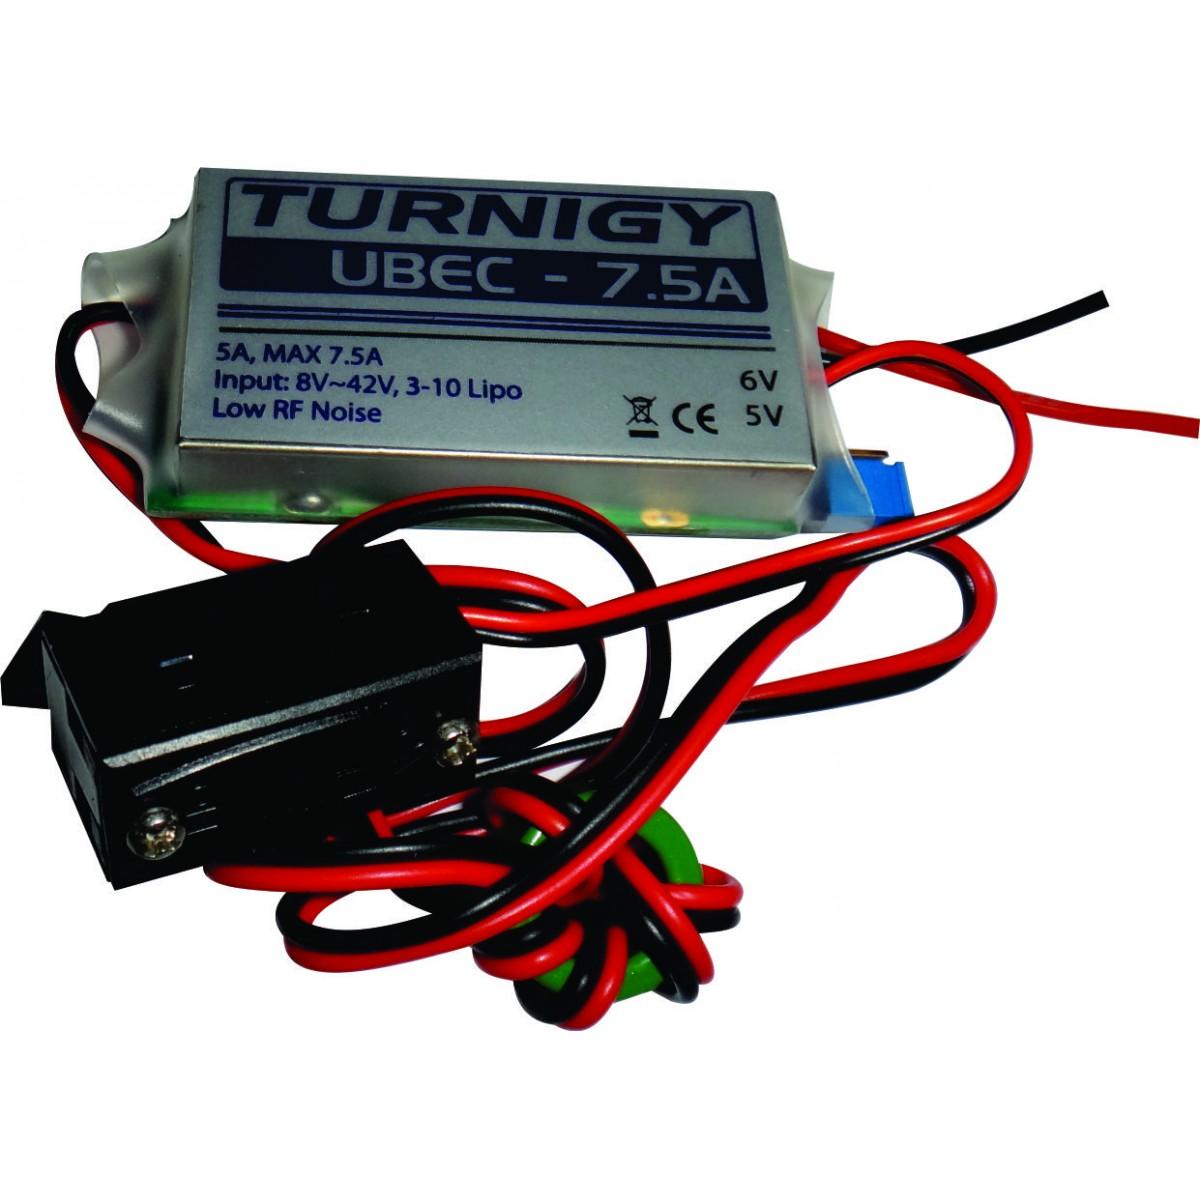 Ultra Bec Regulador De Voltagem 7.5a - Turnigy - 5-6v Saída  - King Models